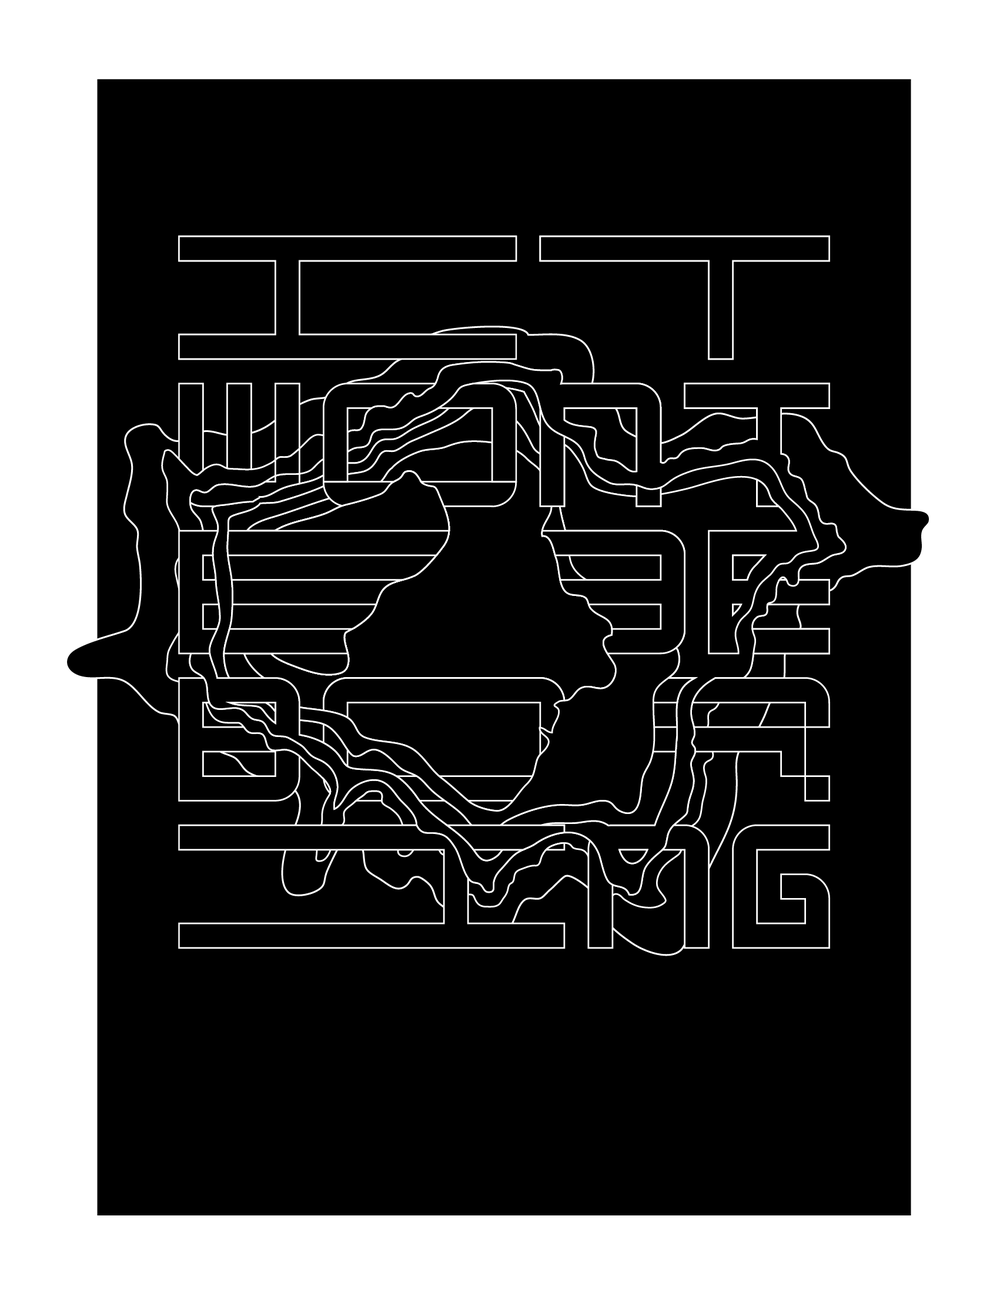 poster sketch-10.png